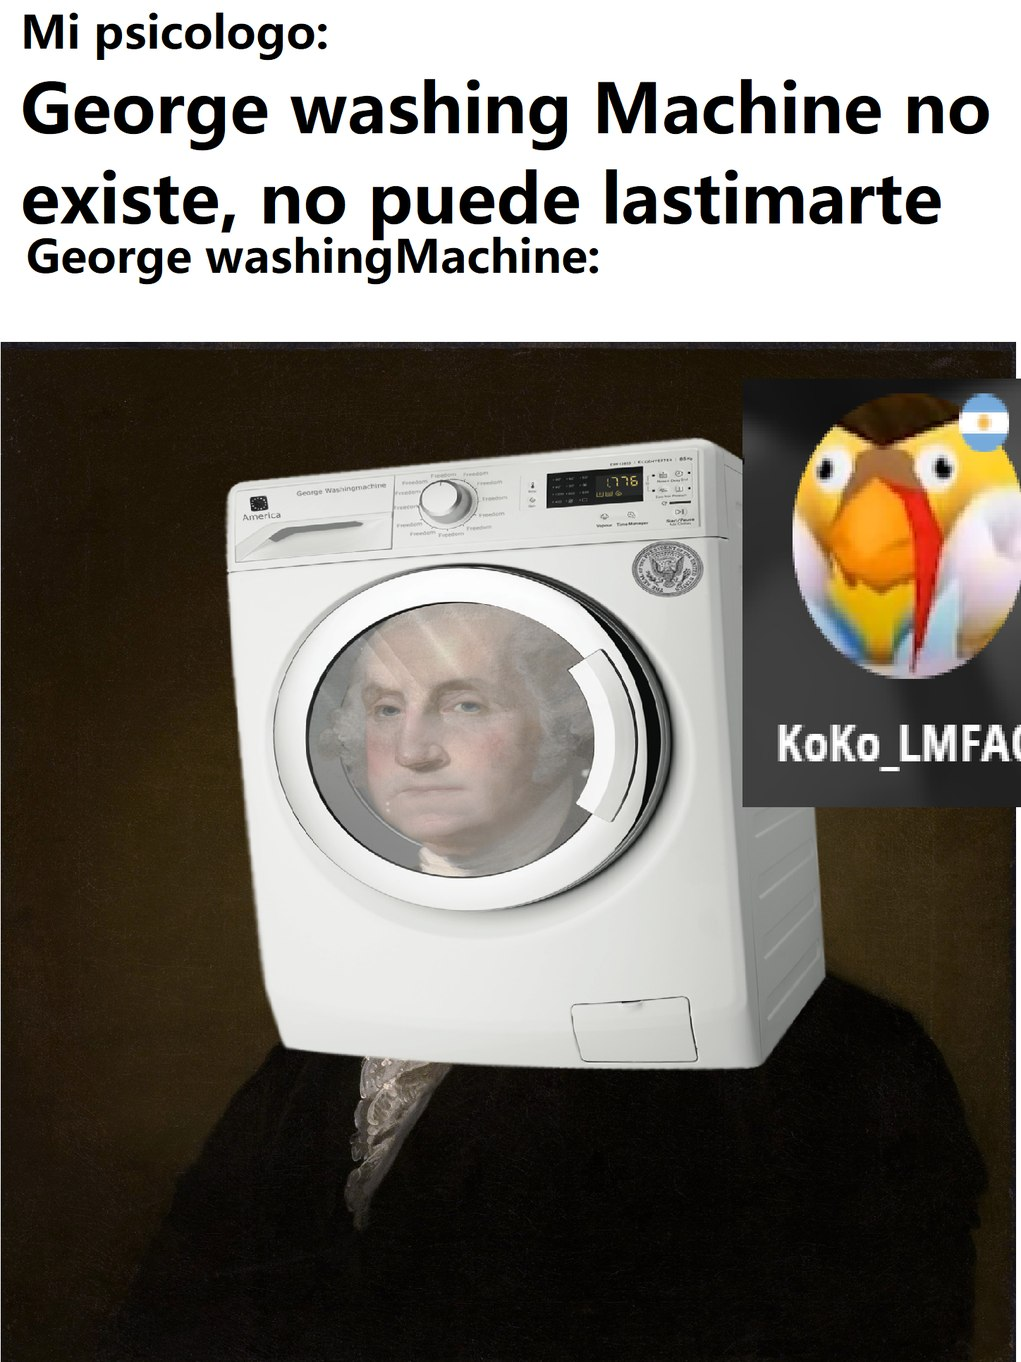 George WashingMachine - meme